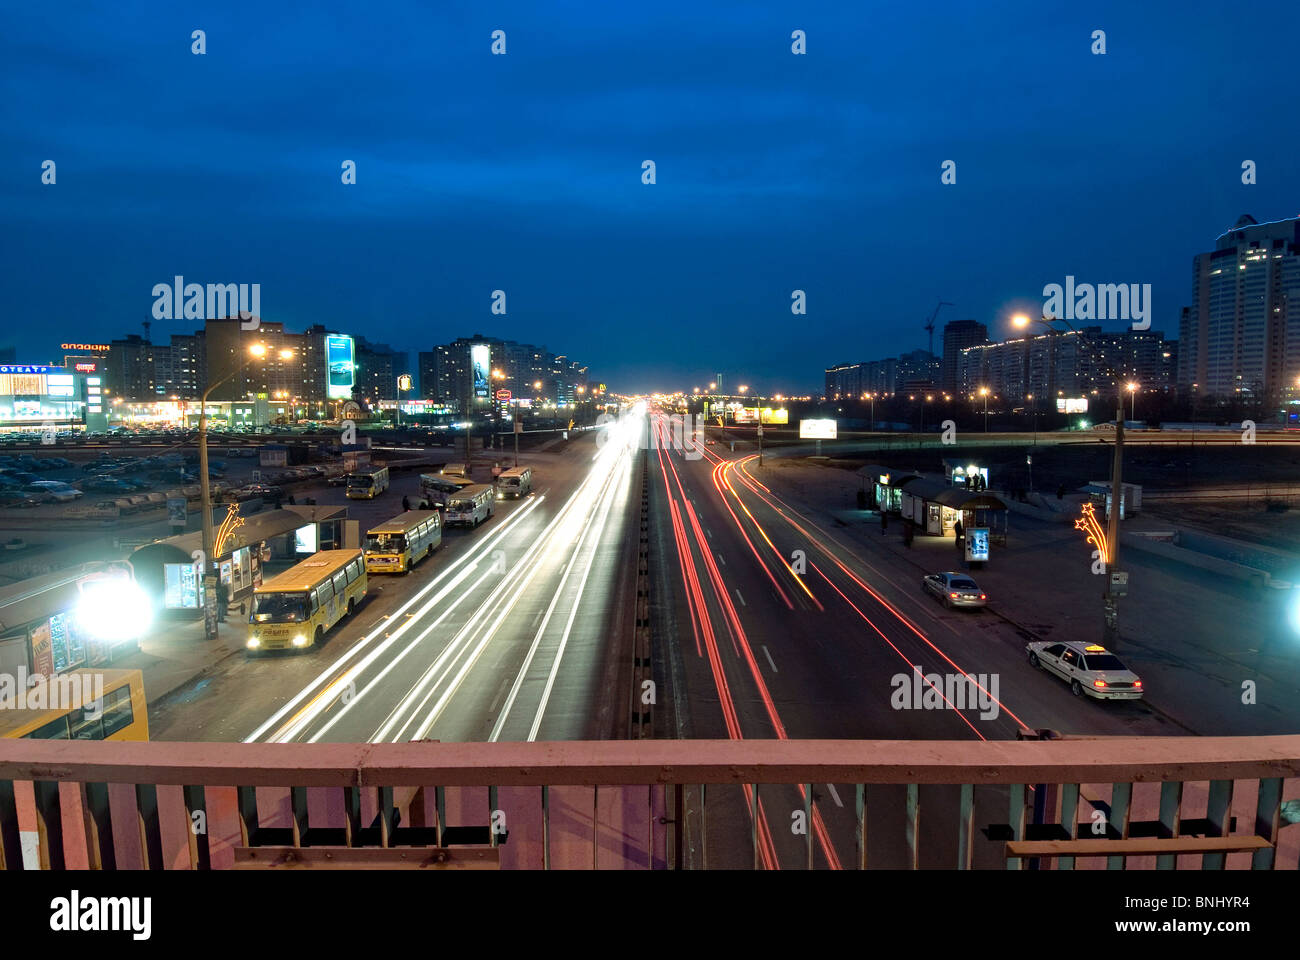 The Ukraine Kiev city Pozniaky periphery E40 highway traffic streets street bridge lights houses dusk night - Stock Image